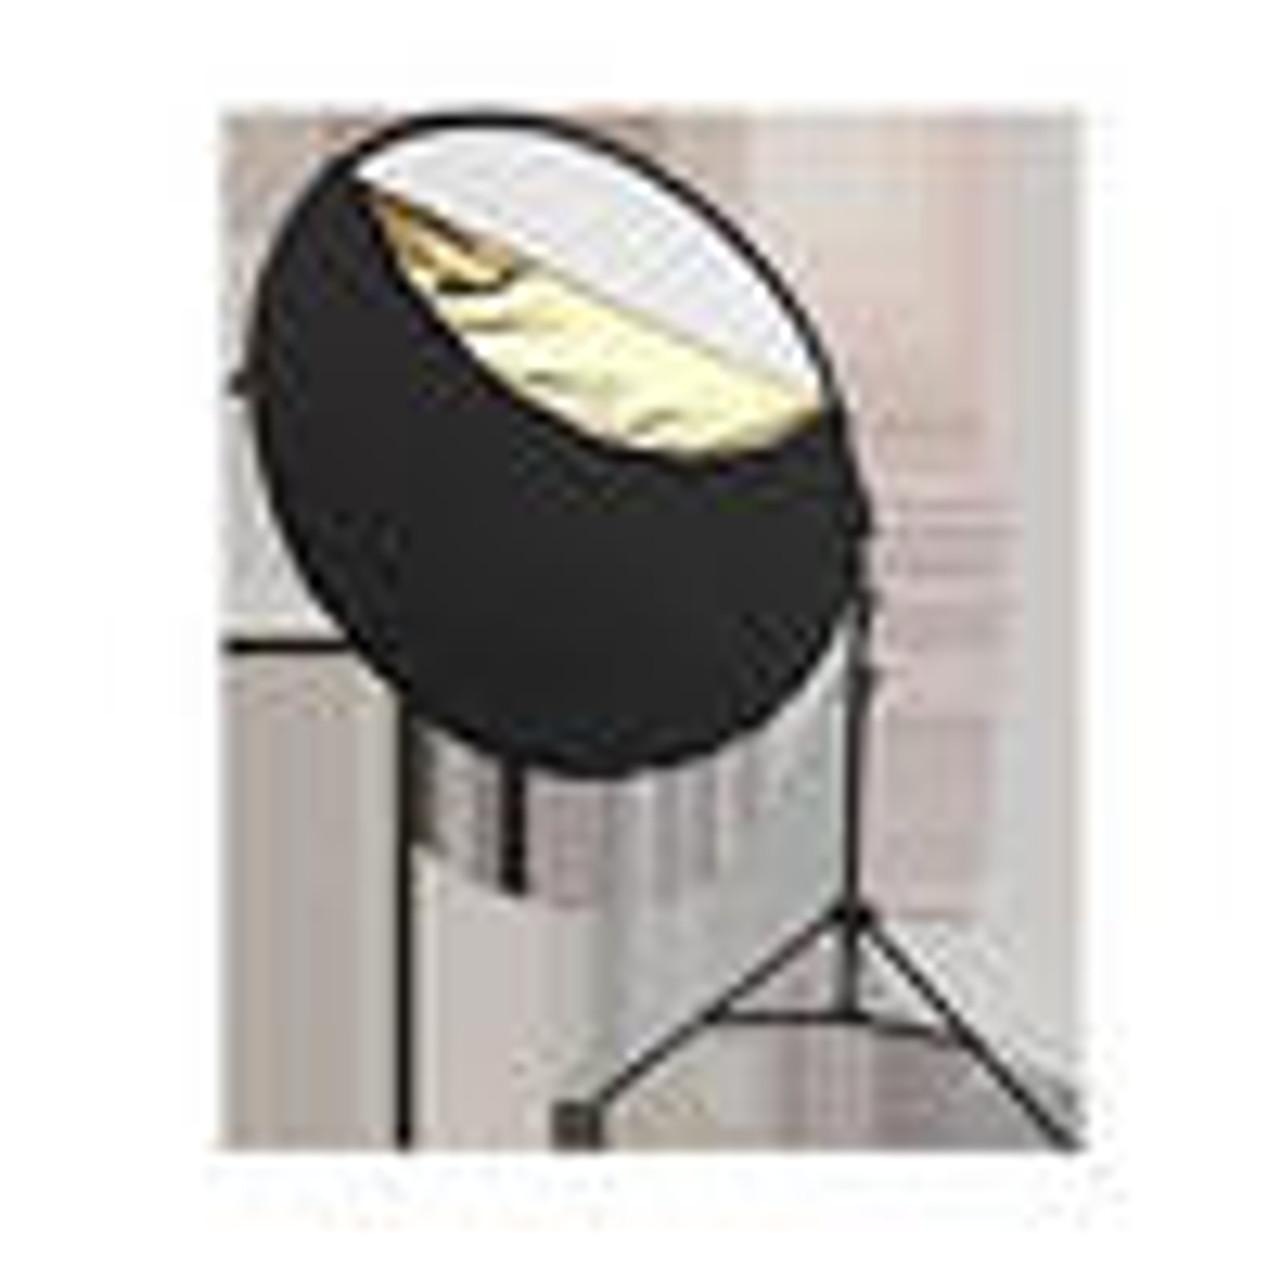 "Westcott Photo Basics 5-in-1 Reflector Kit (40.5"")"